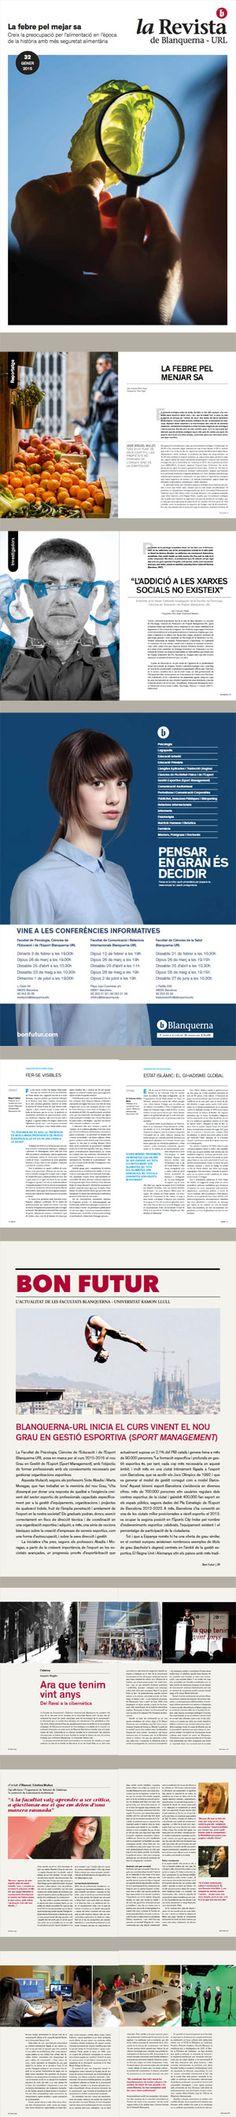 Maqueta, La revista de Blanquerna, 32, 2015 #design #university #Blanquerna